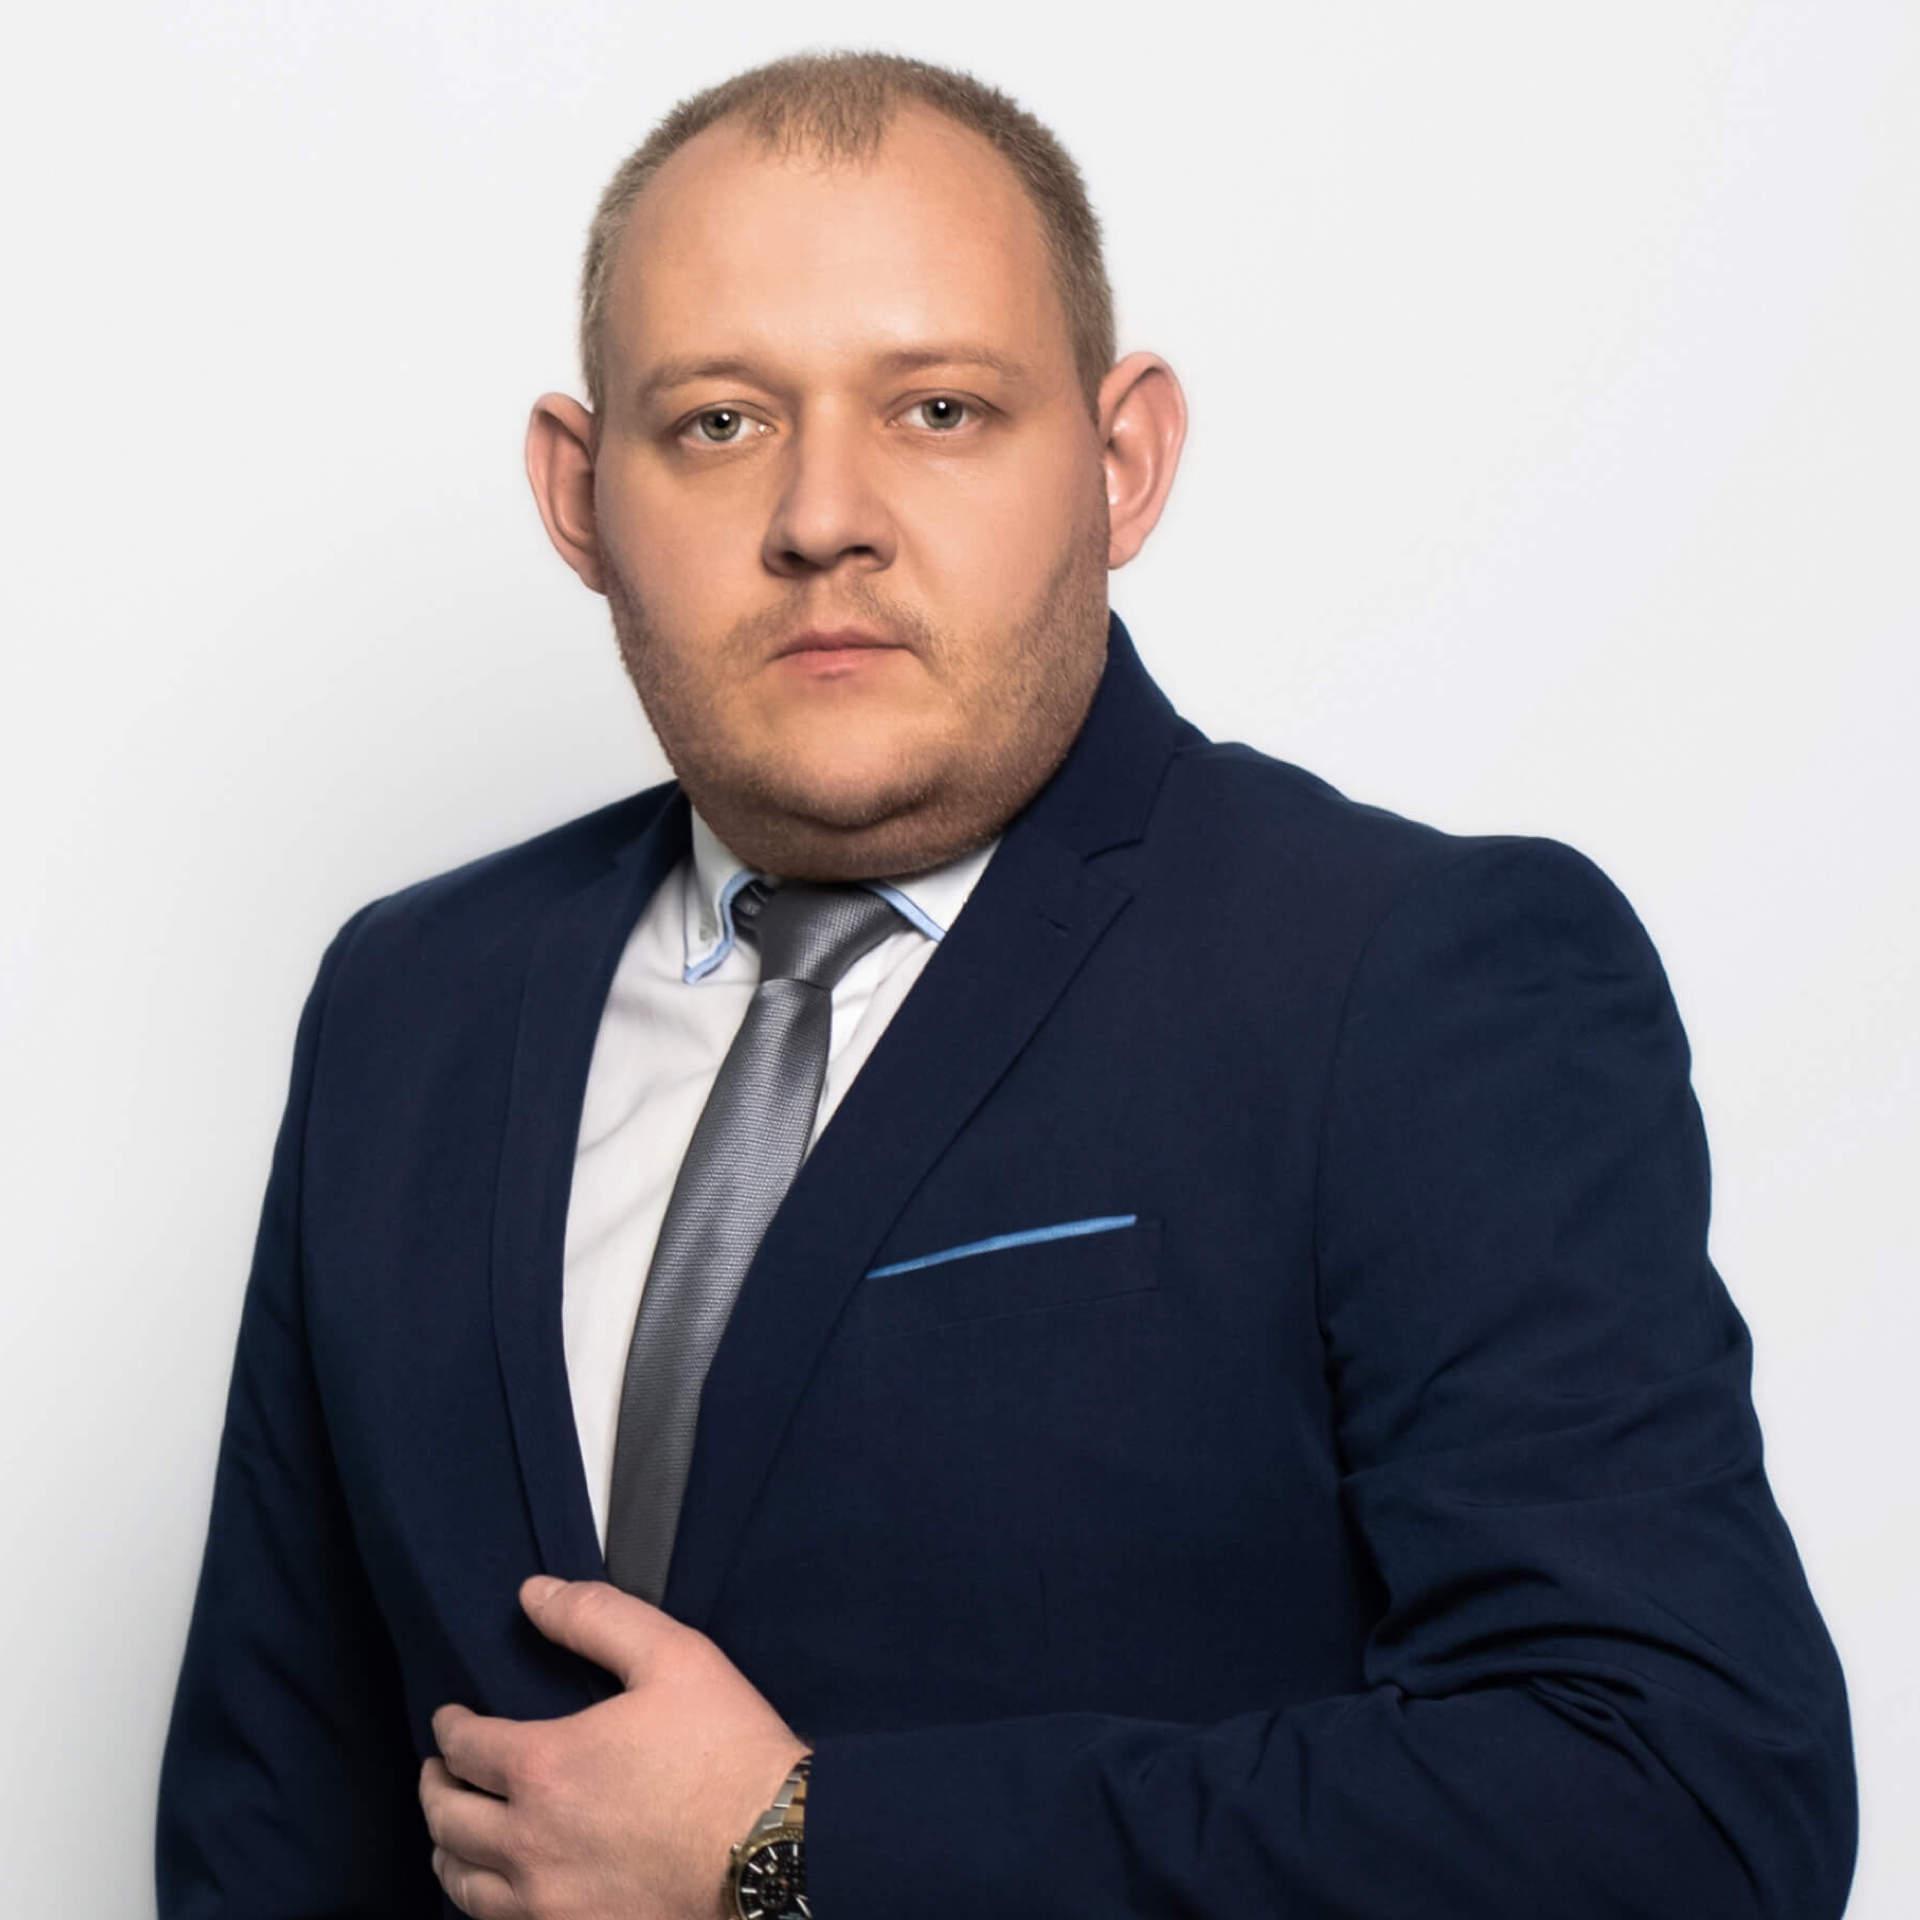 Mateusz Kaniewski